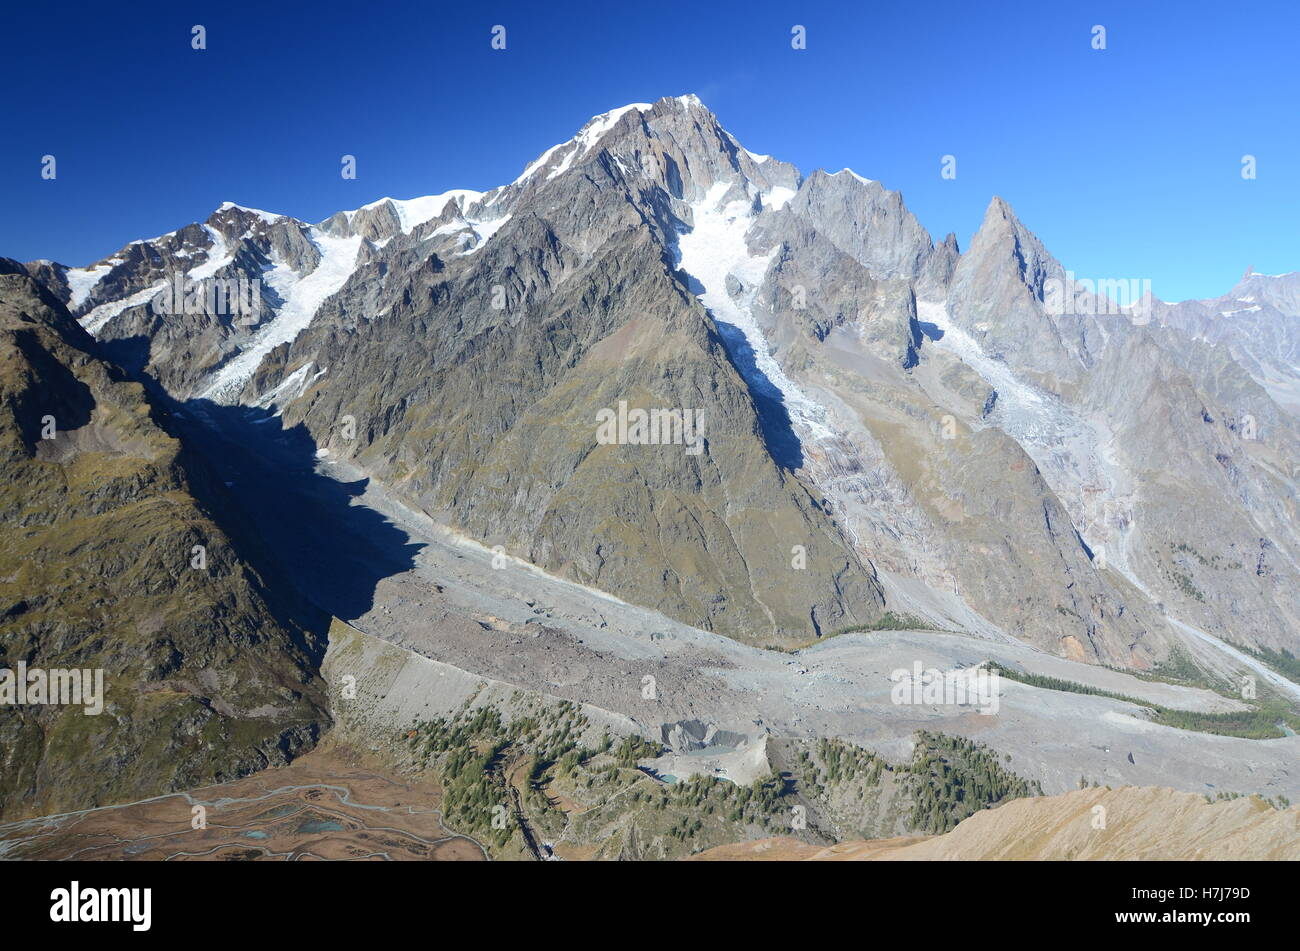 View on Val Veny - Stock Image